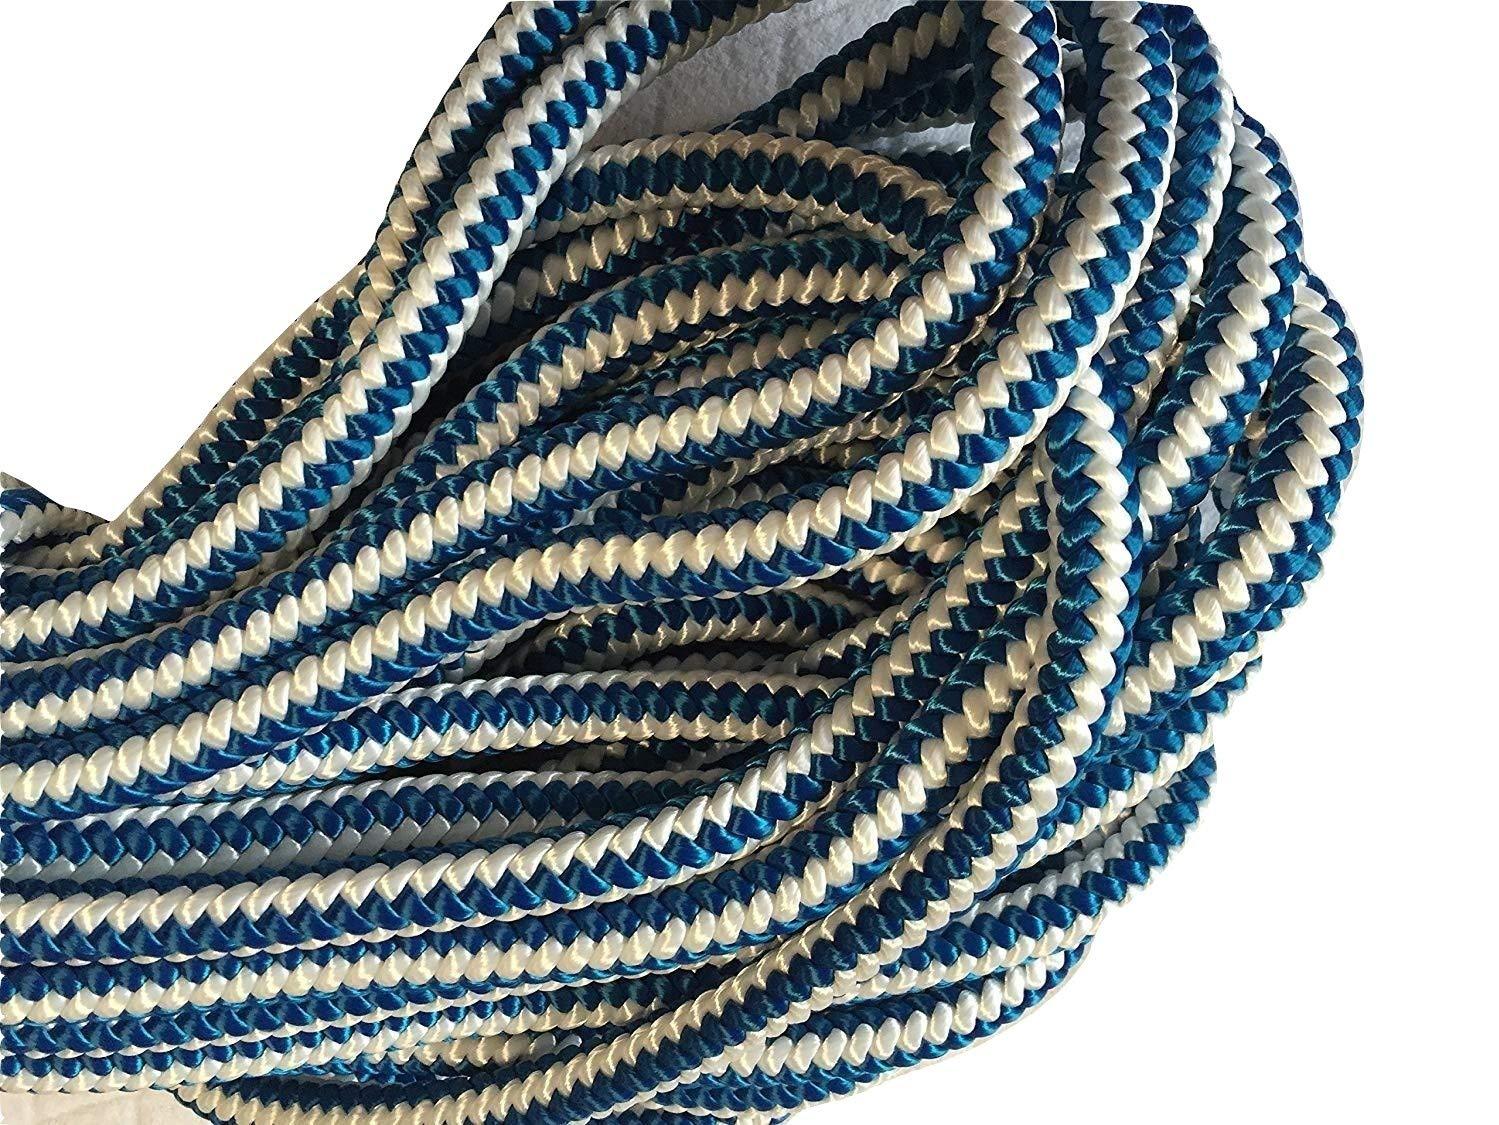 1/2'' X 120 feet, 12-strand Polyester Blue Ox Arborist Climbing Rope